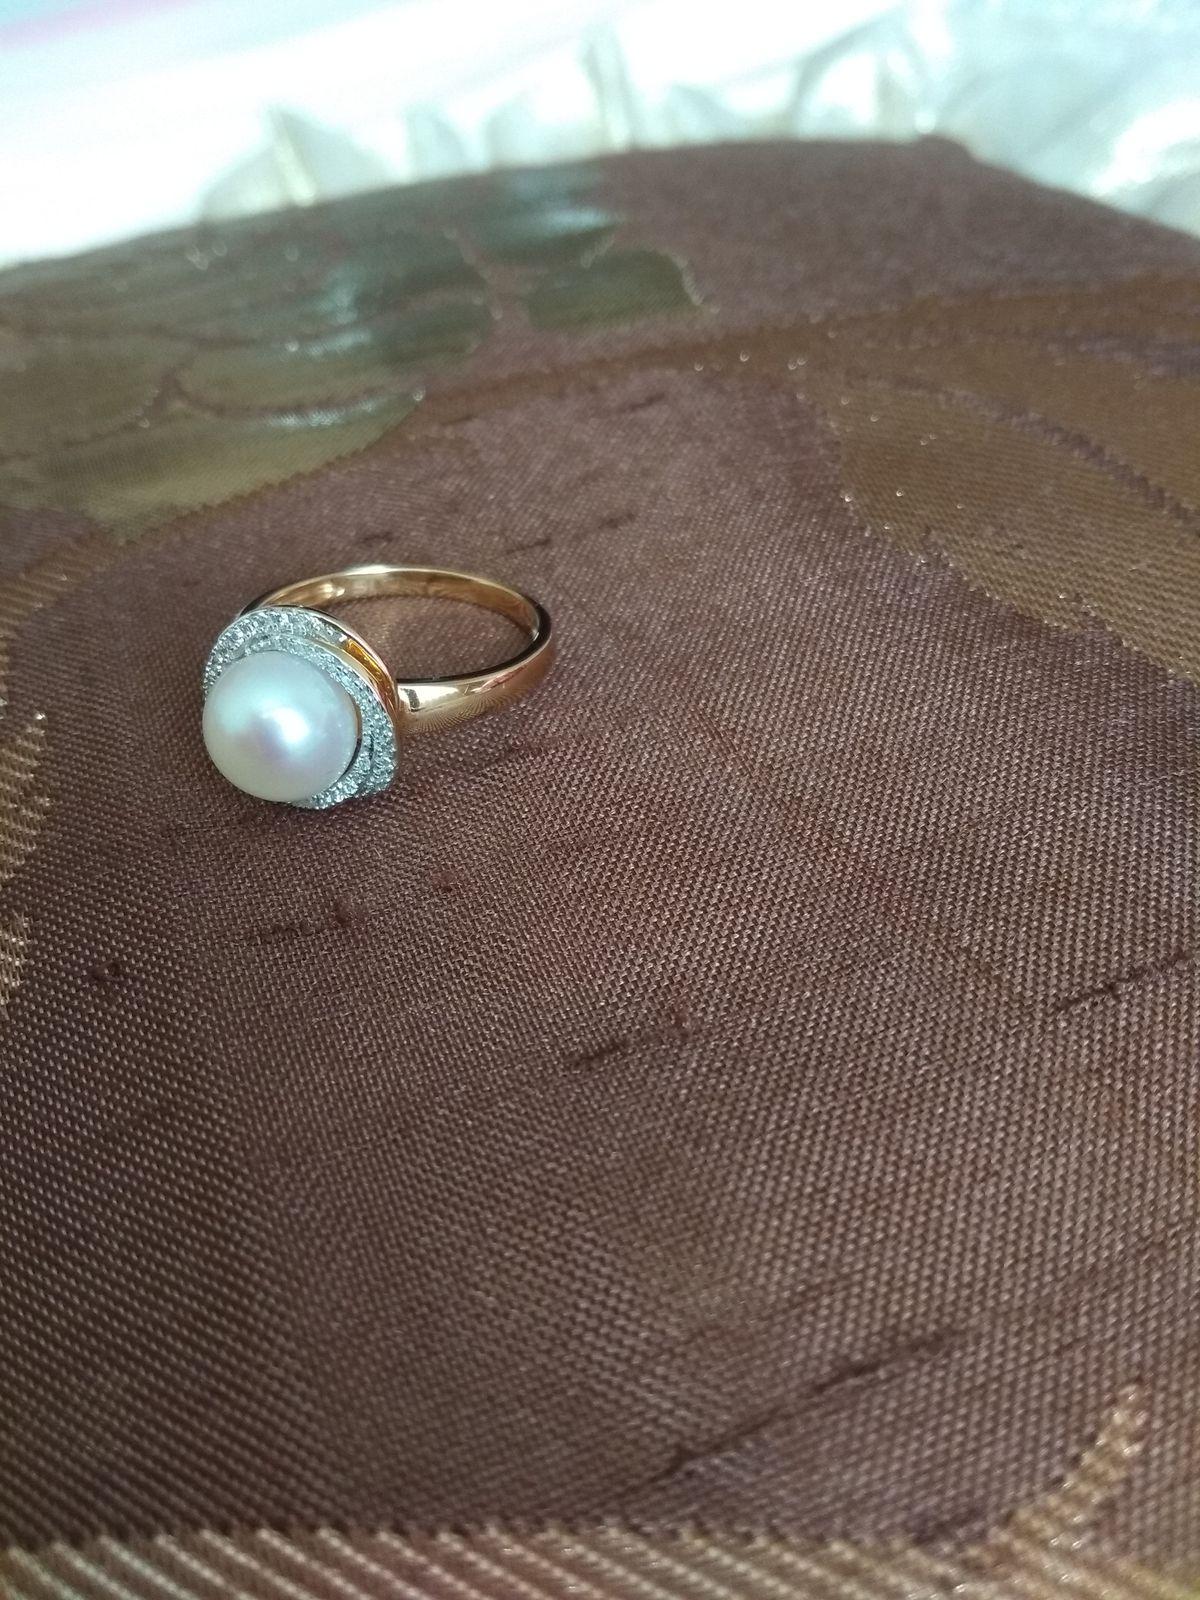 Кольцо с жемчугом и бриллиантами.